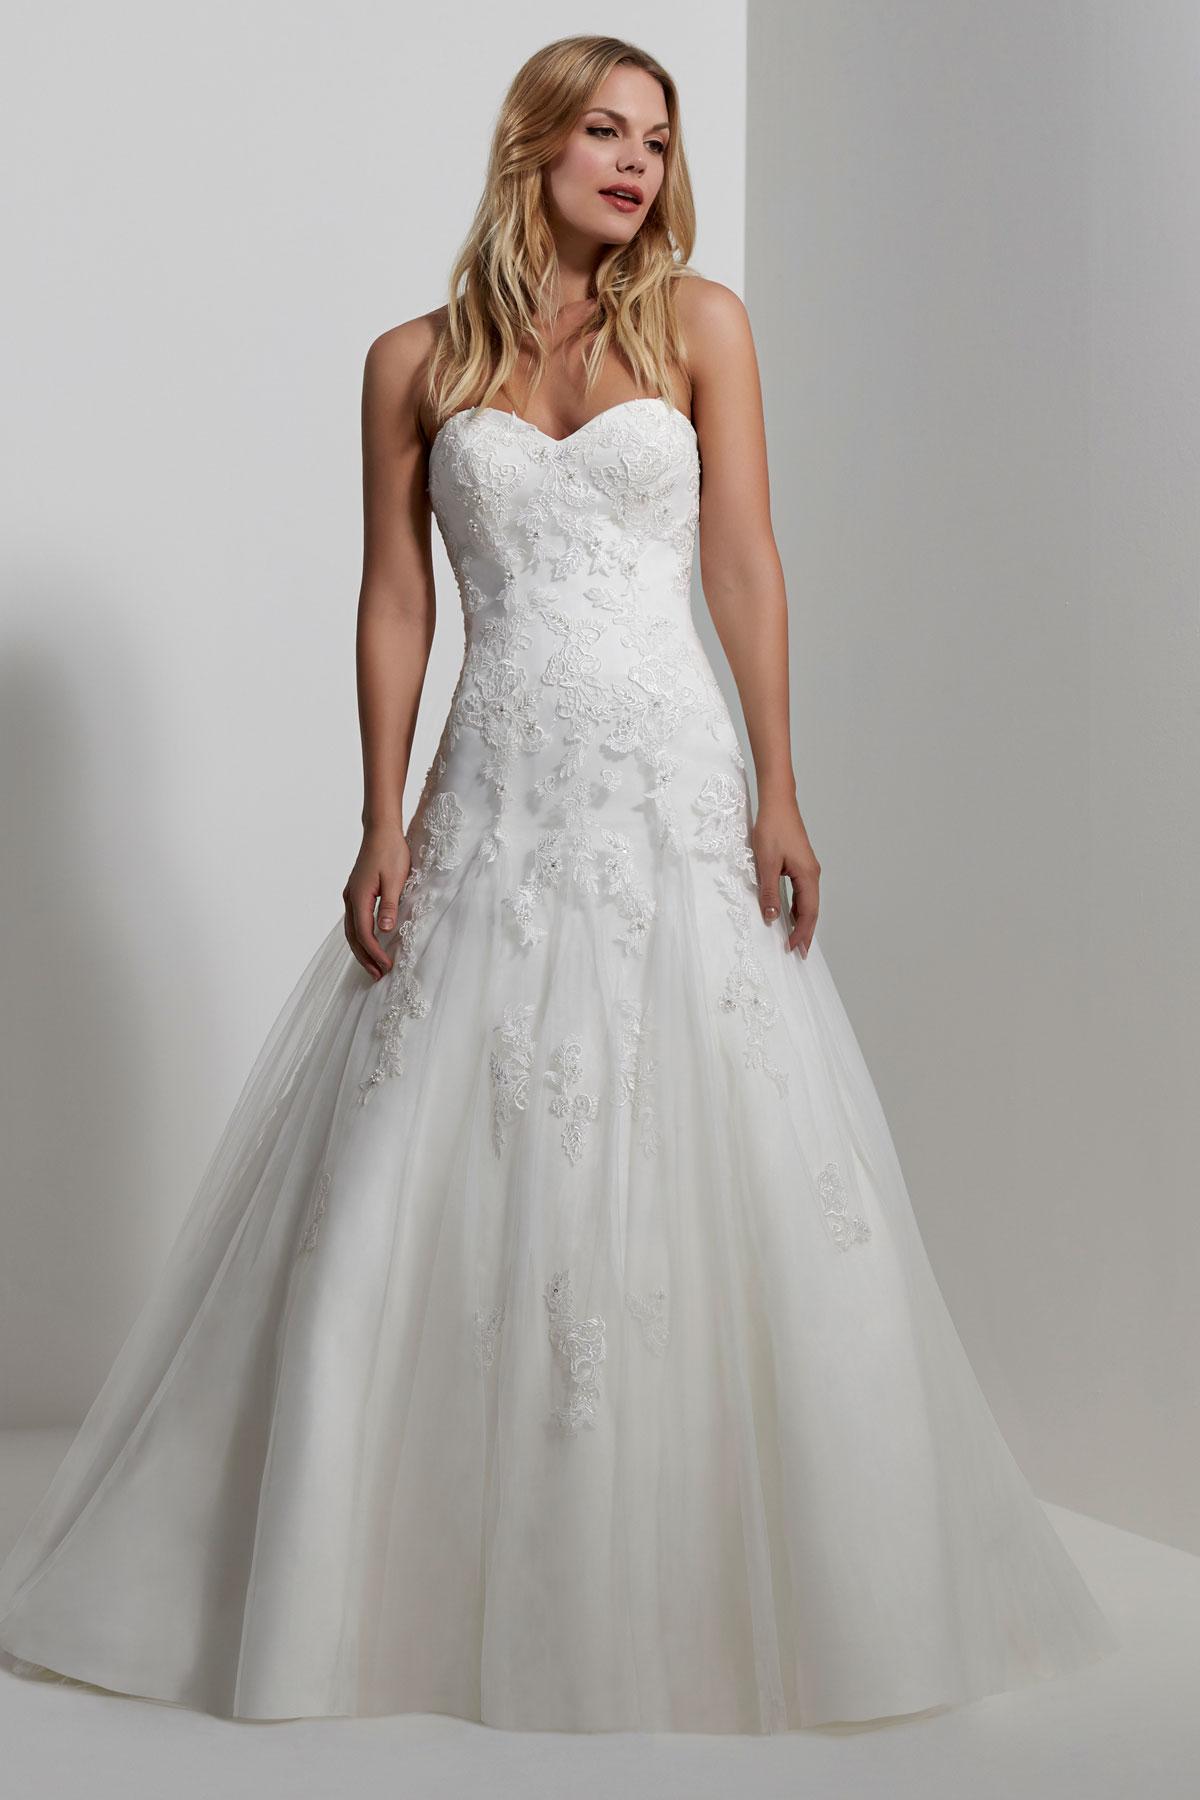 wedding event dresses photo - 1